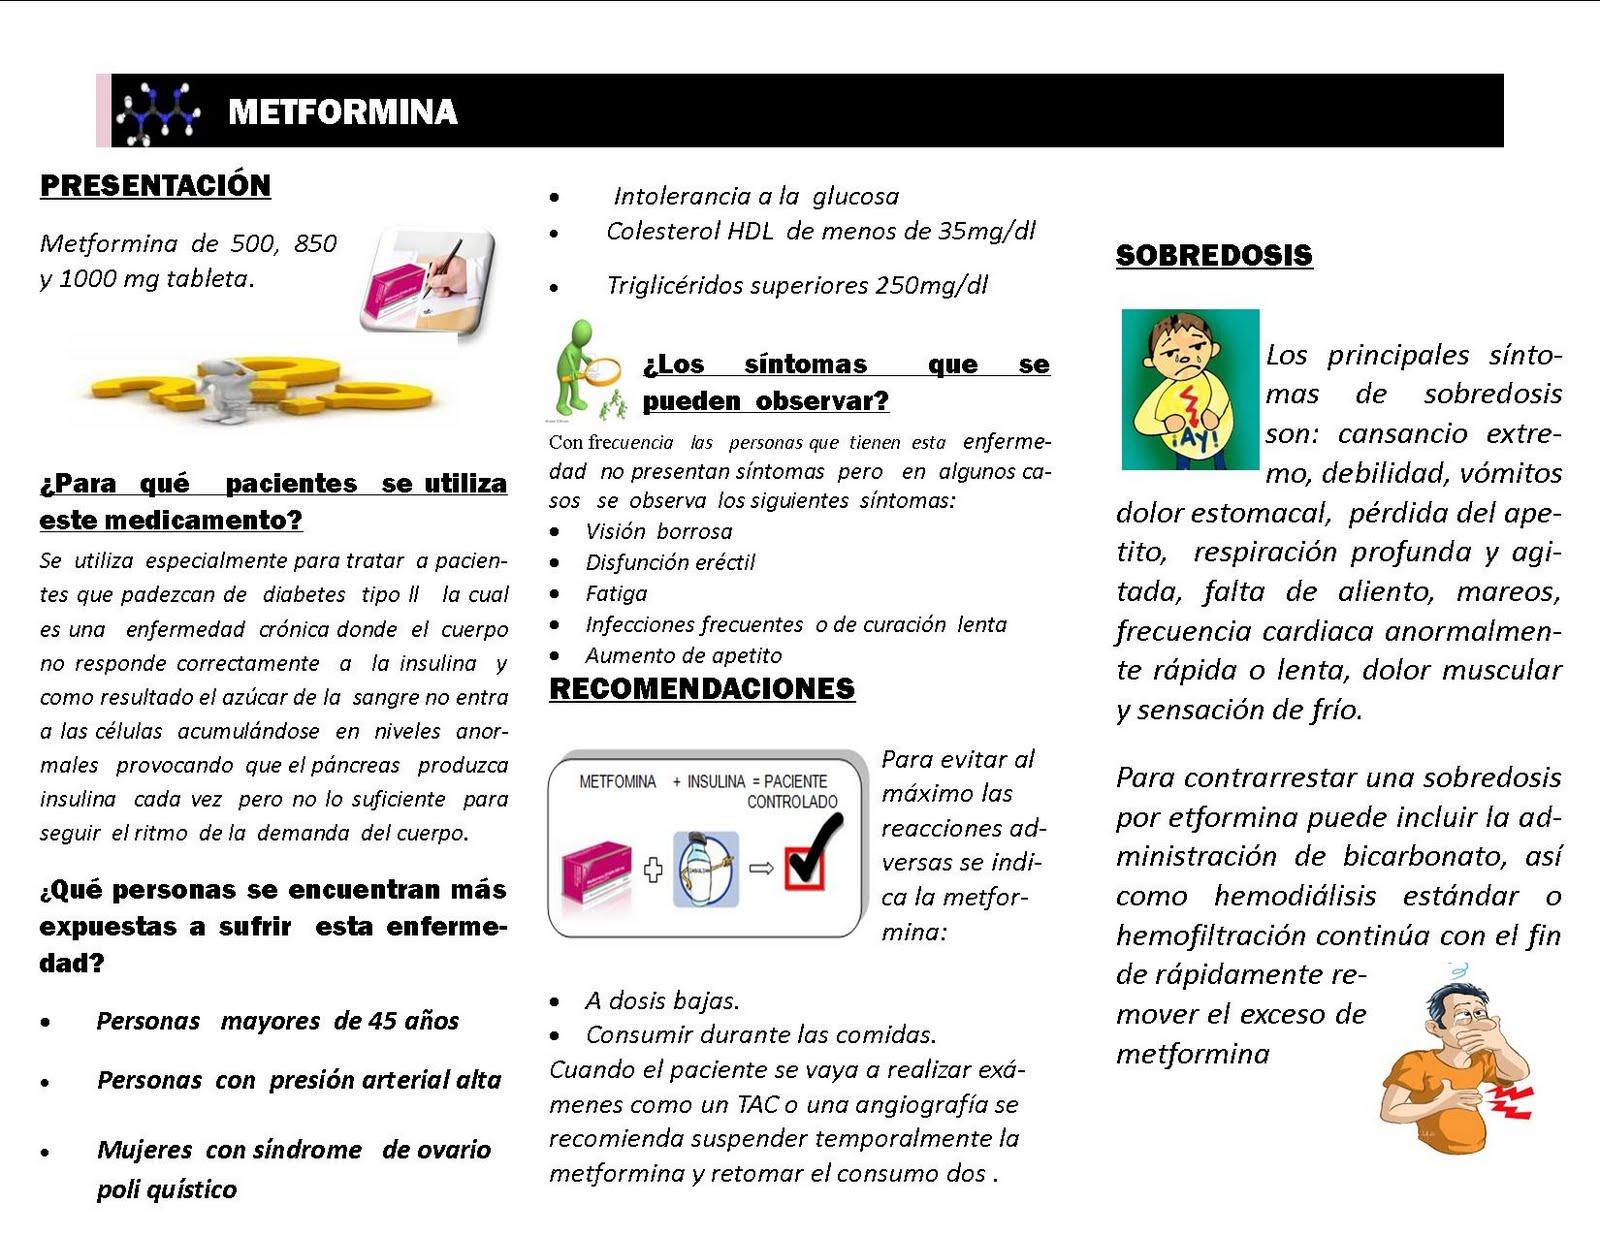 HIPOGLIMED: METFORMINA